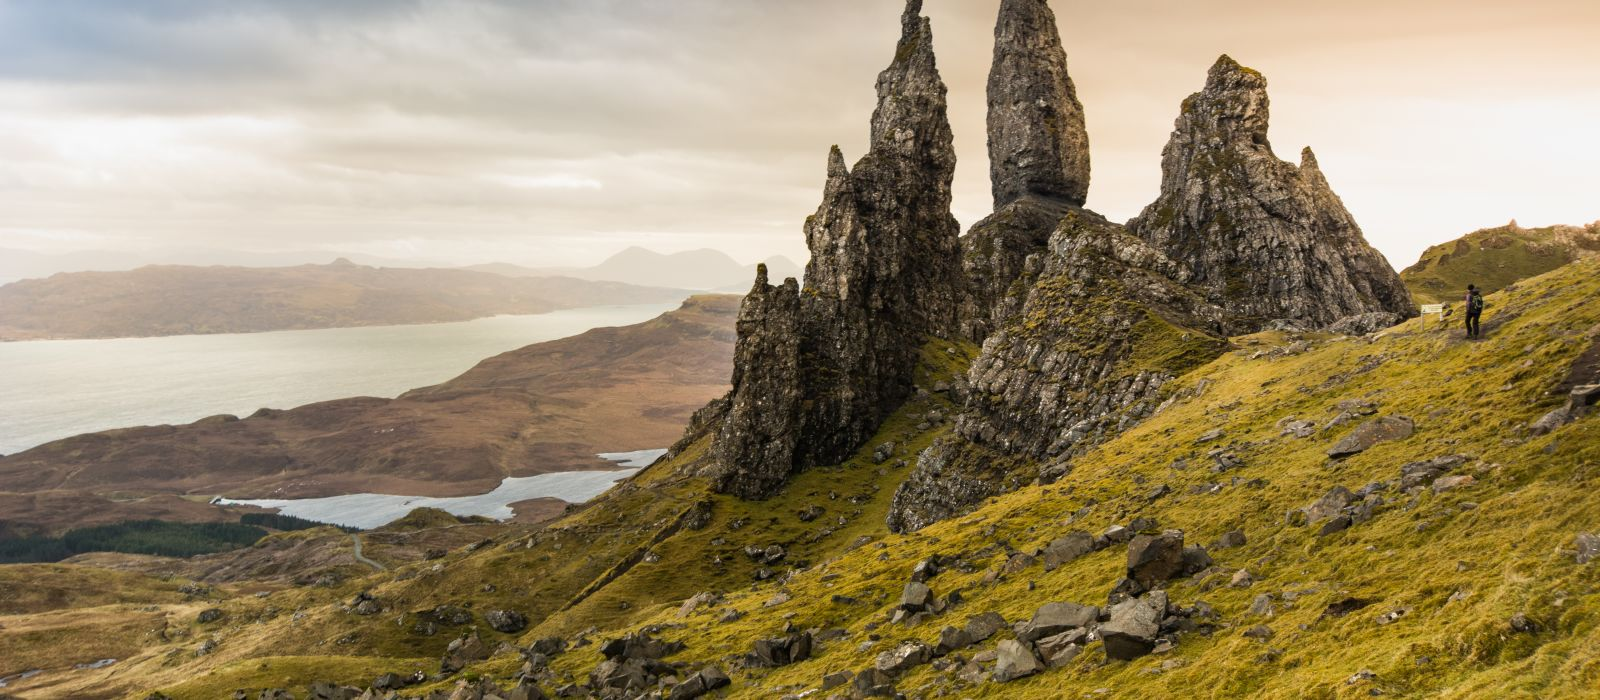 Overland Highlights of Scotland Tour Trip 4